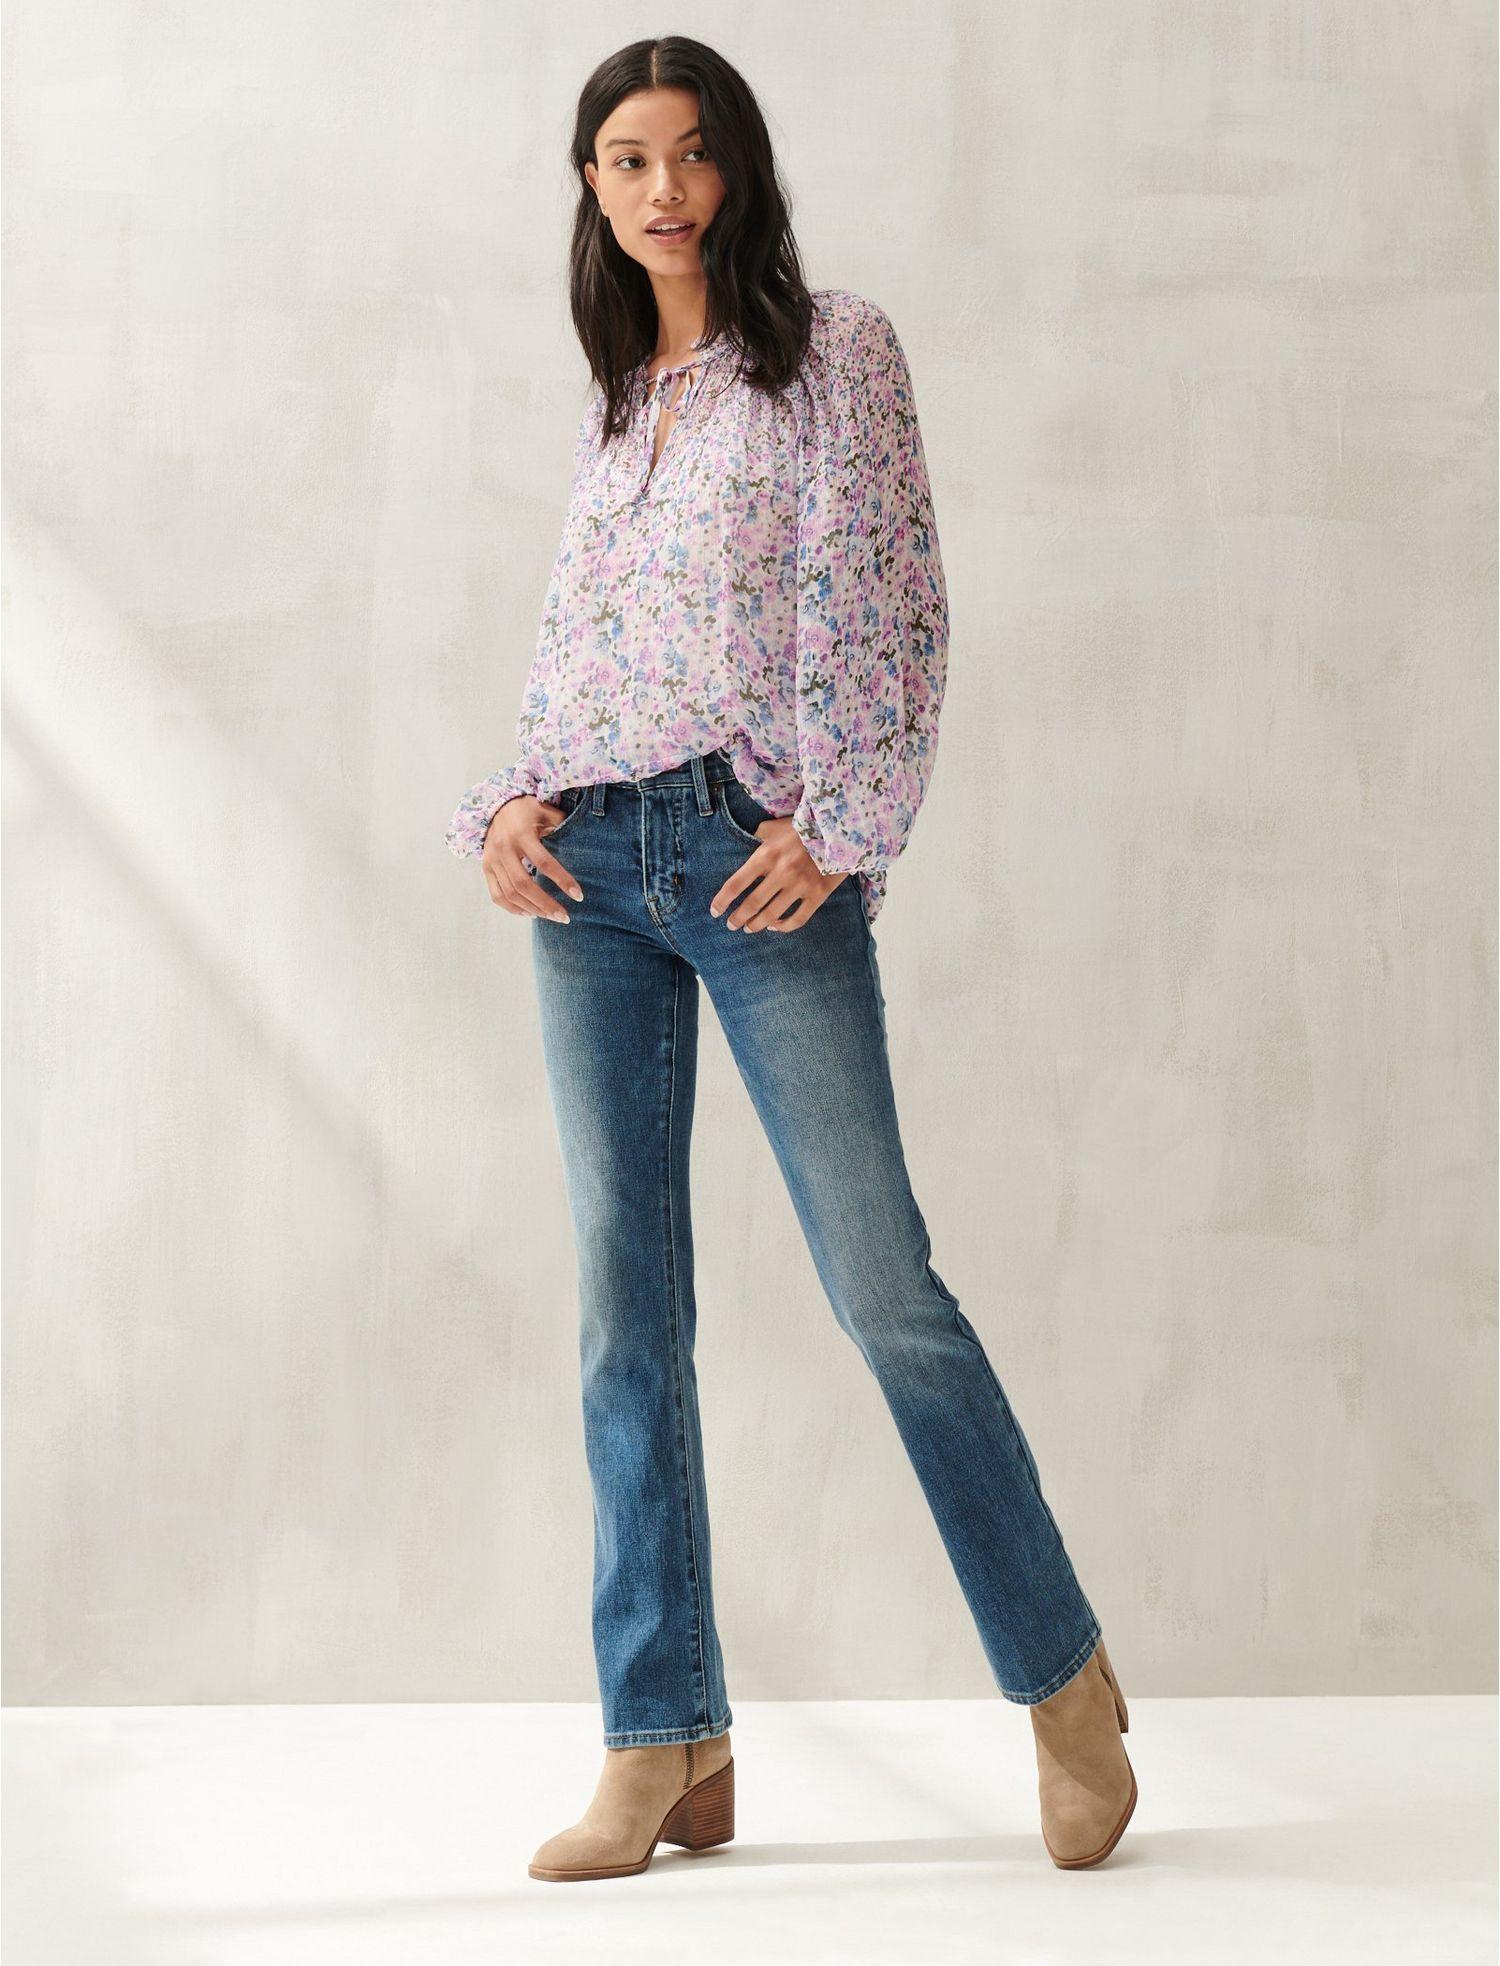 Lucky Brand Sweet /'n Low rise Boot Cut Women/'s Blue Jeans Sz 25 27 28 29 30 31